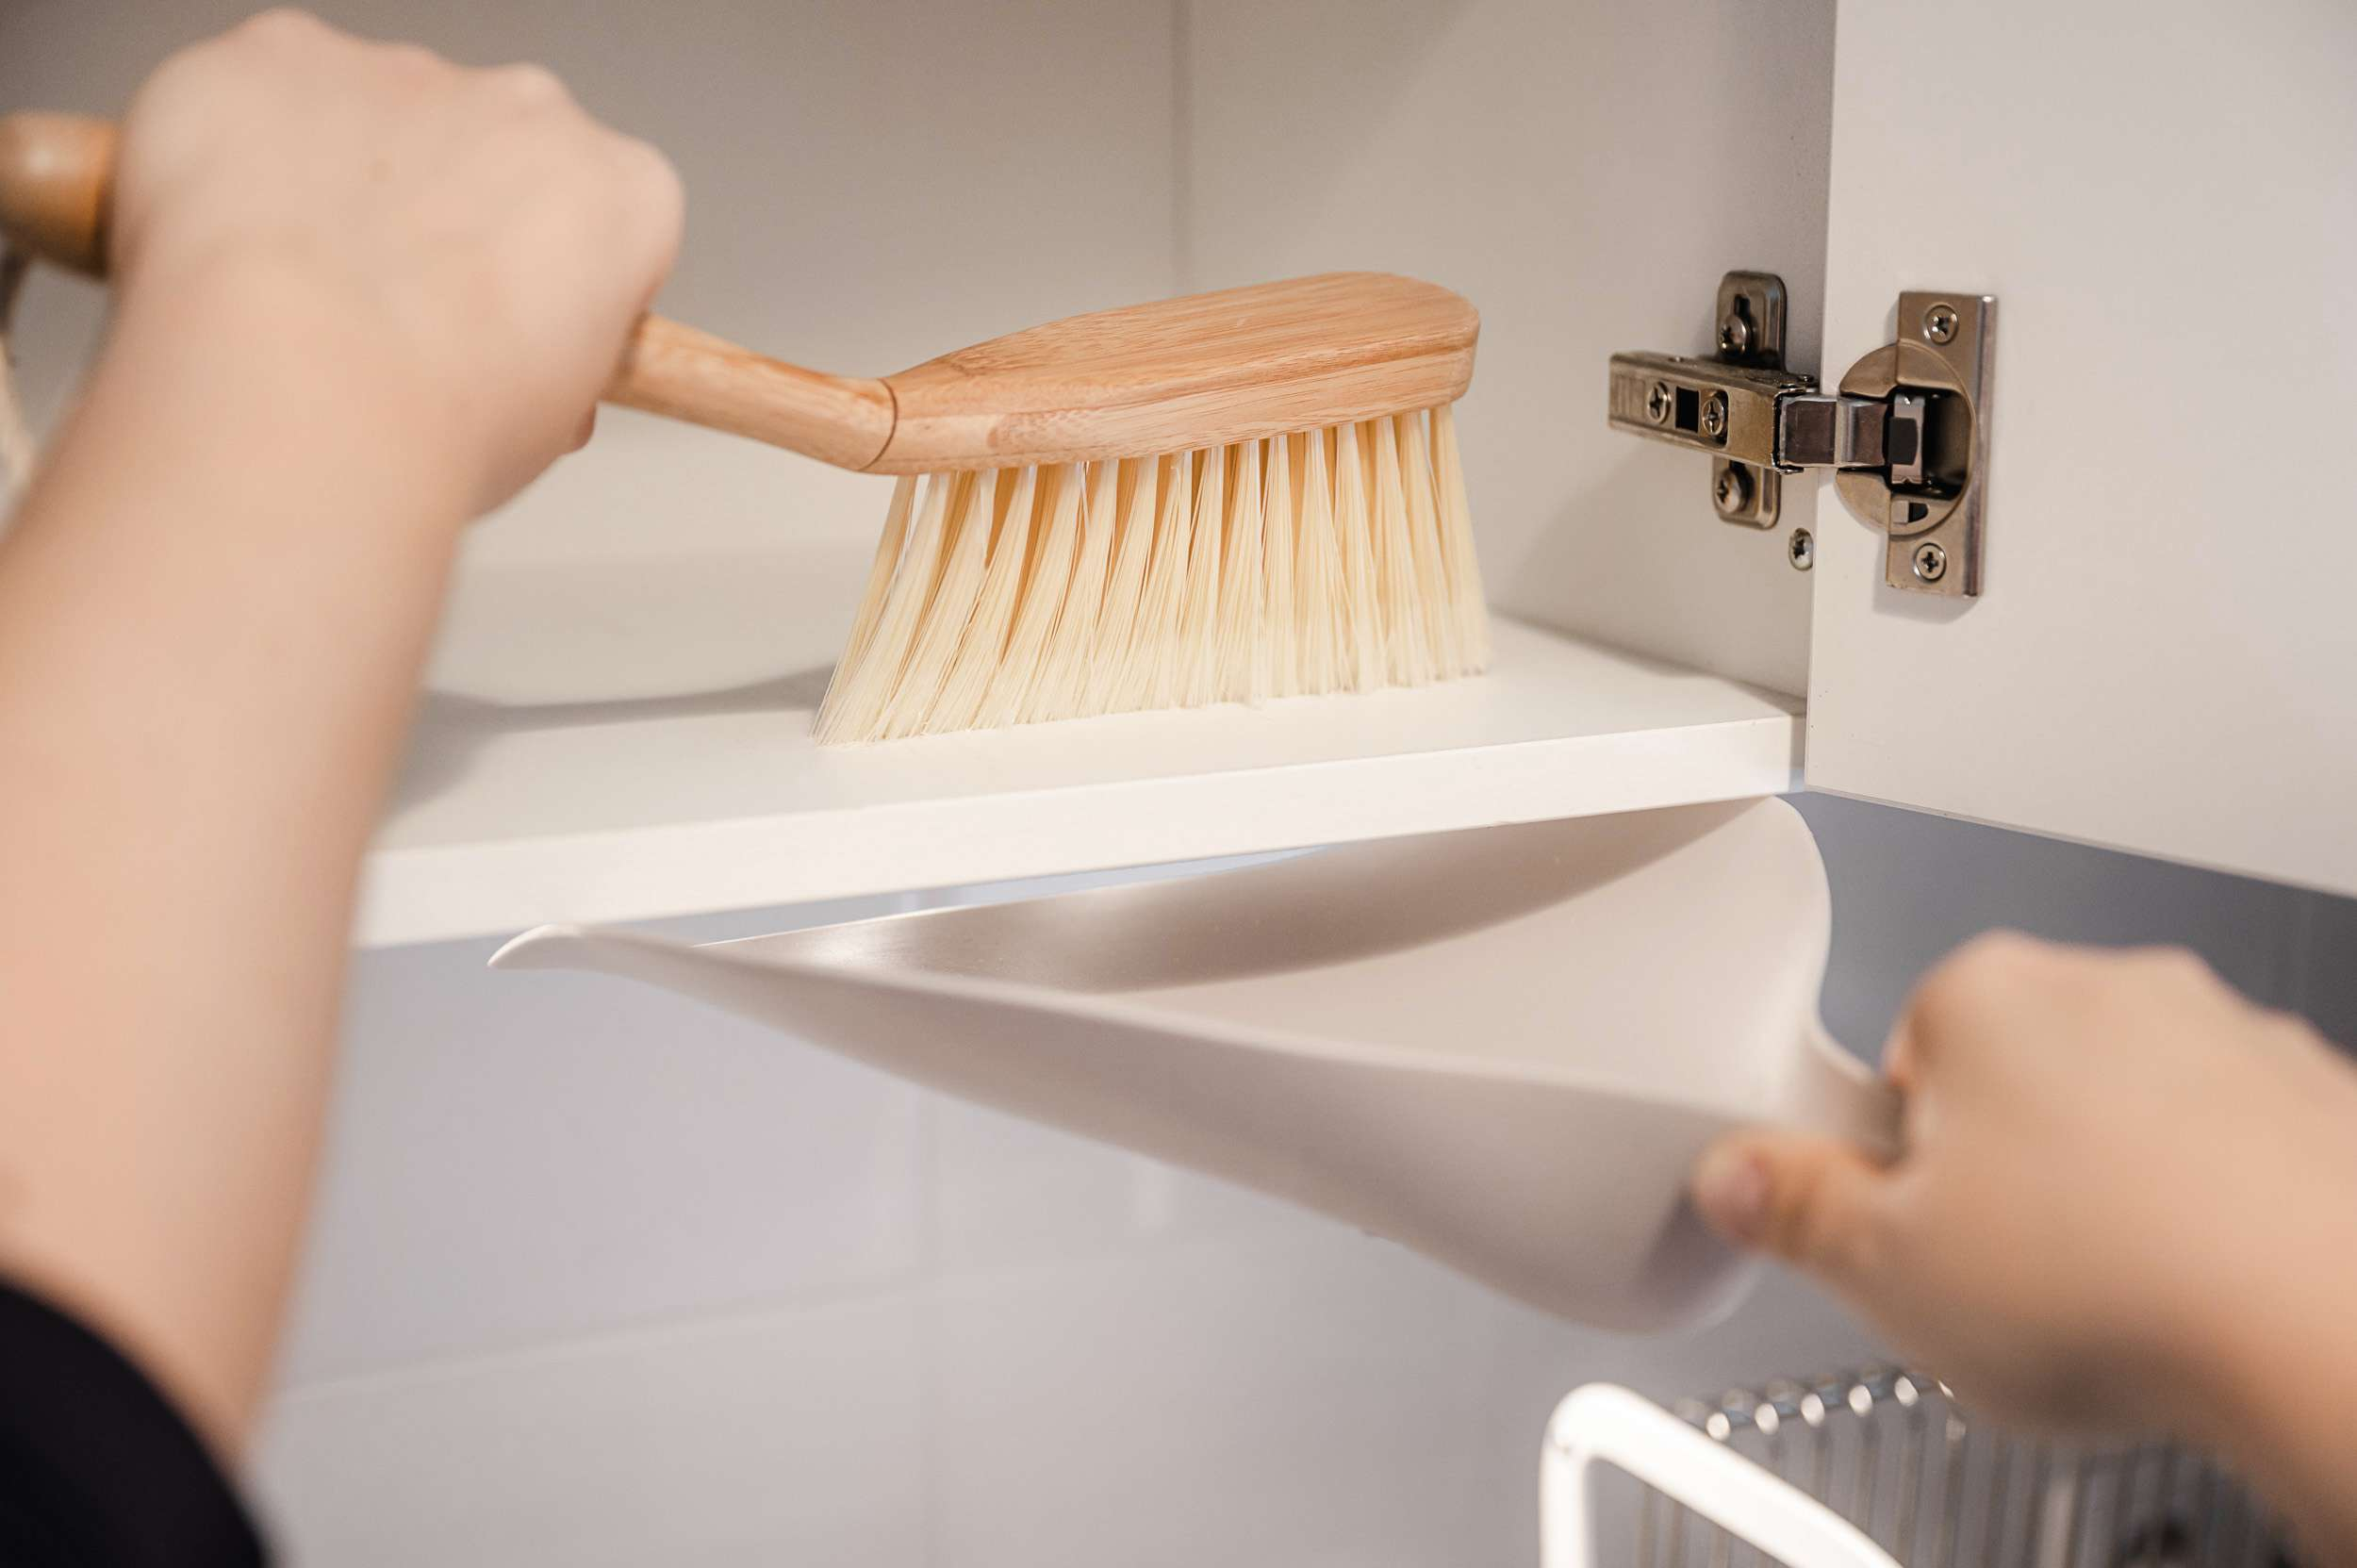 Bottom shelf of kitchen pantry swept by soft bristled brush and pan